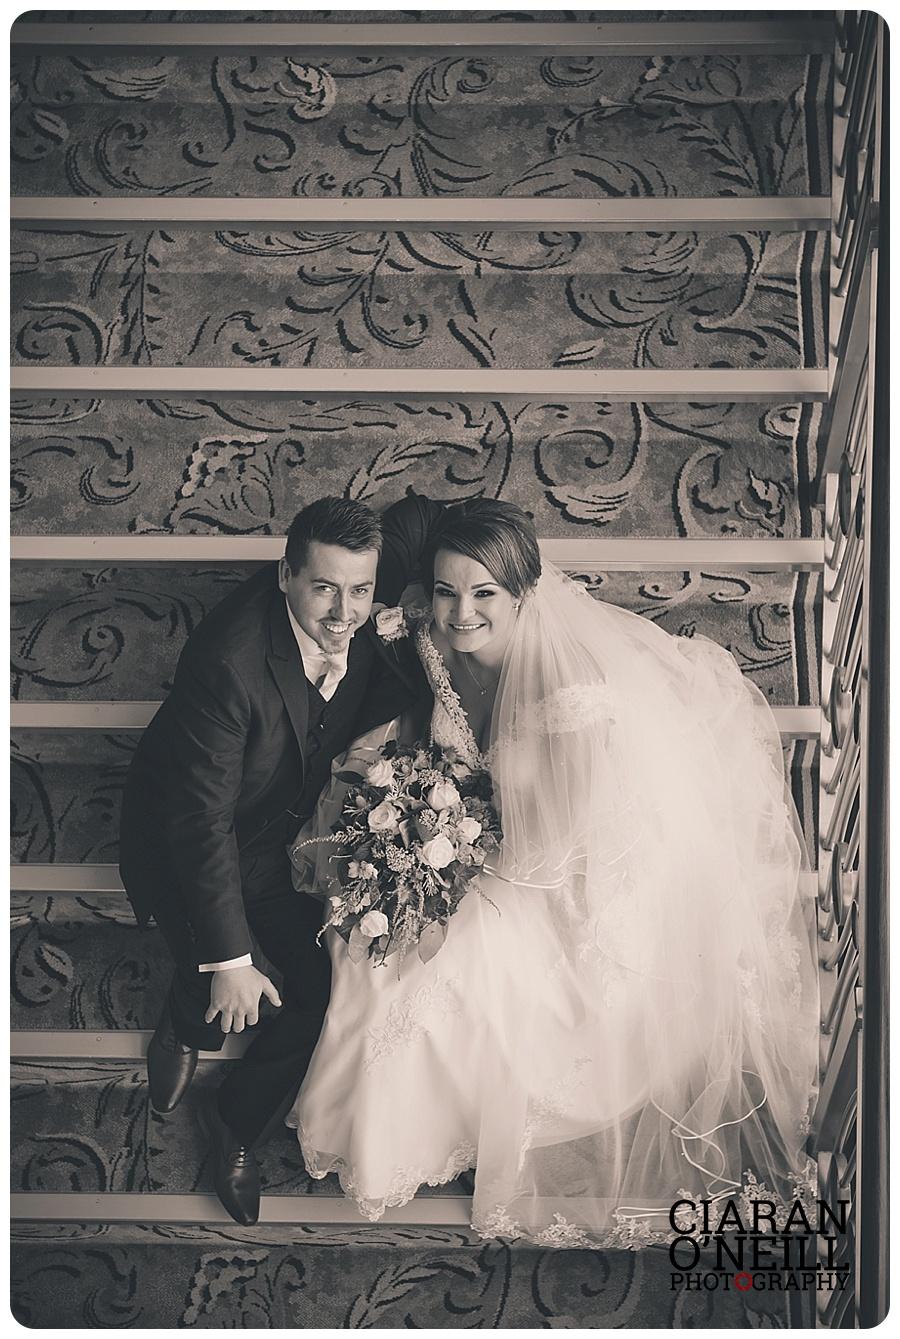 Ashlene & Kyle's wedding at the Four Seasons Hotel Carlingford by Ciaran O'Neill Photography